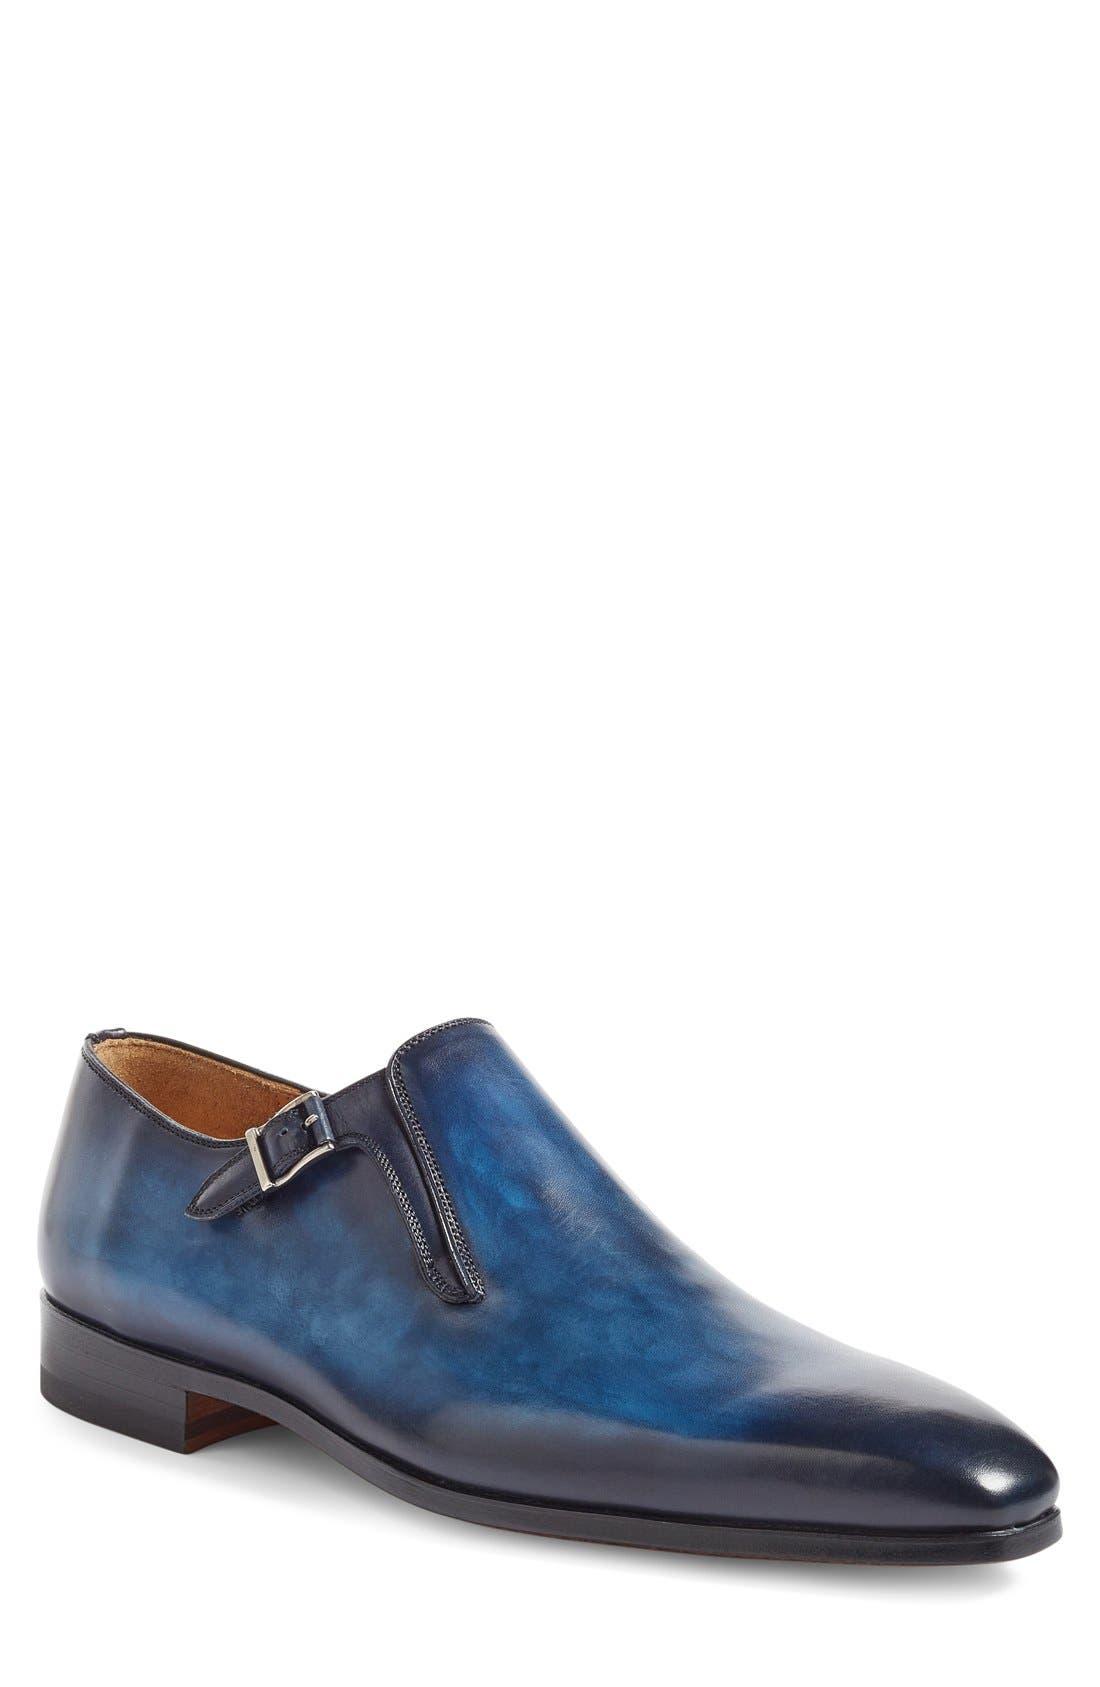 Beltran Monk Strap Shoe,                         Main,                         color, Navy